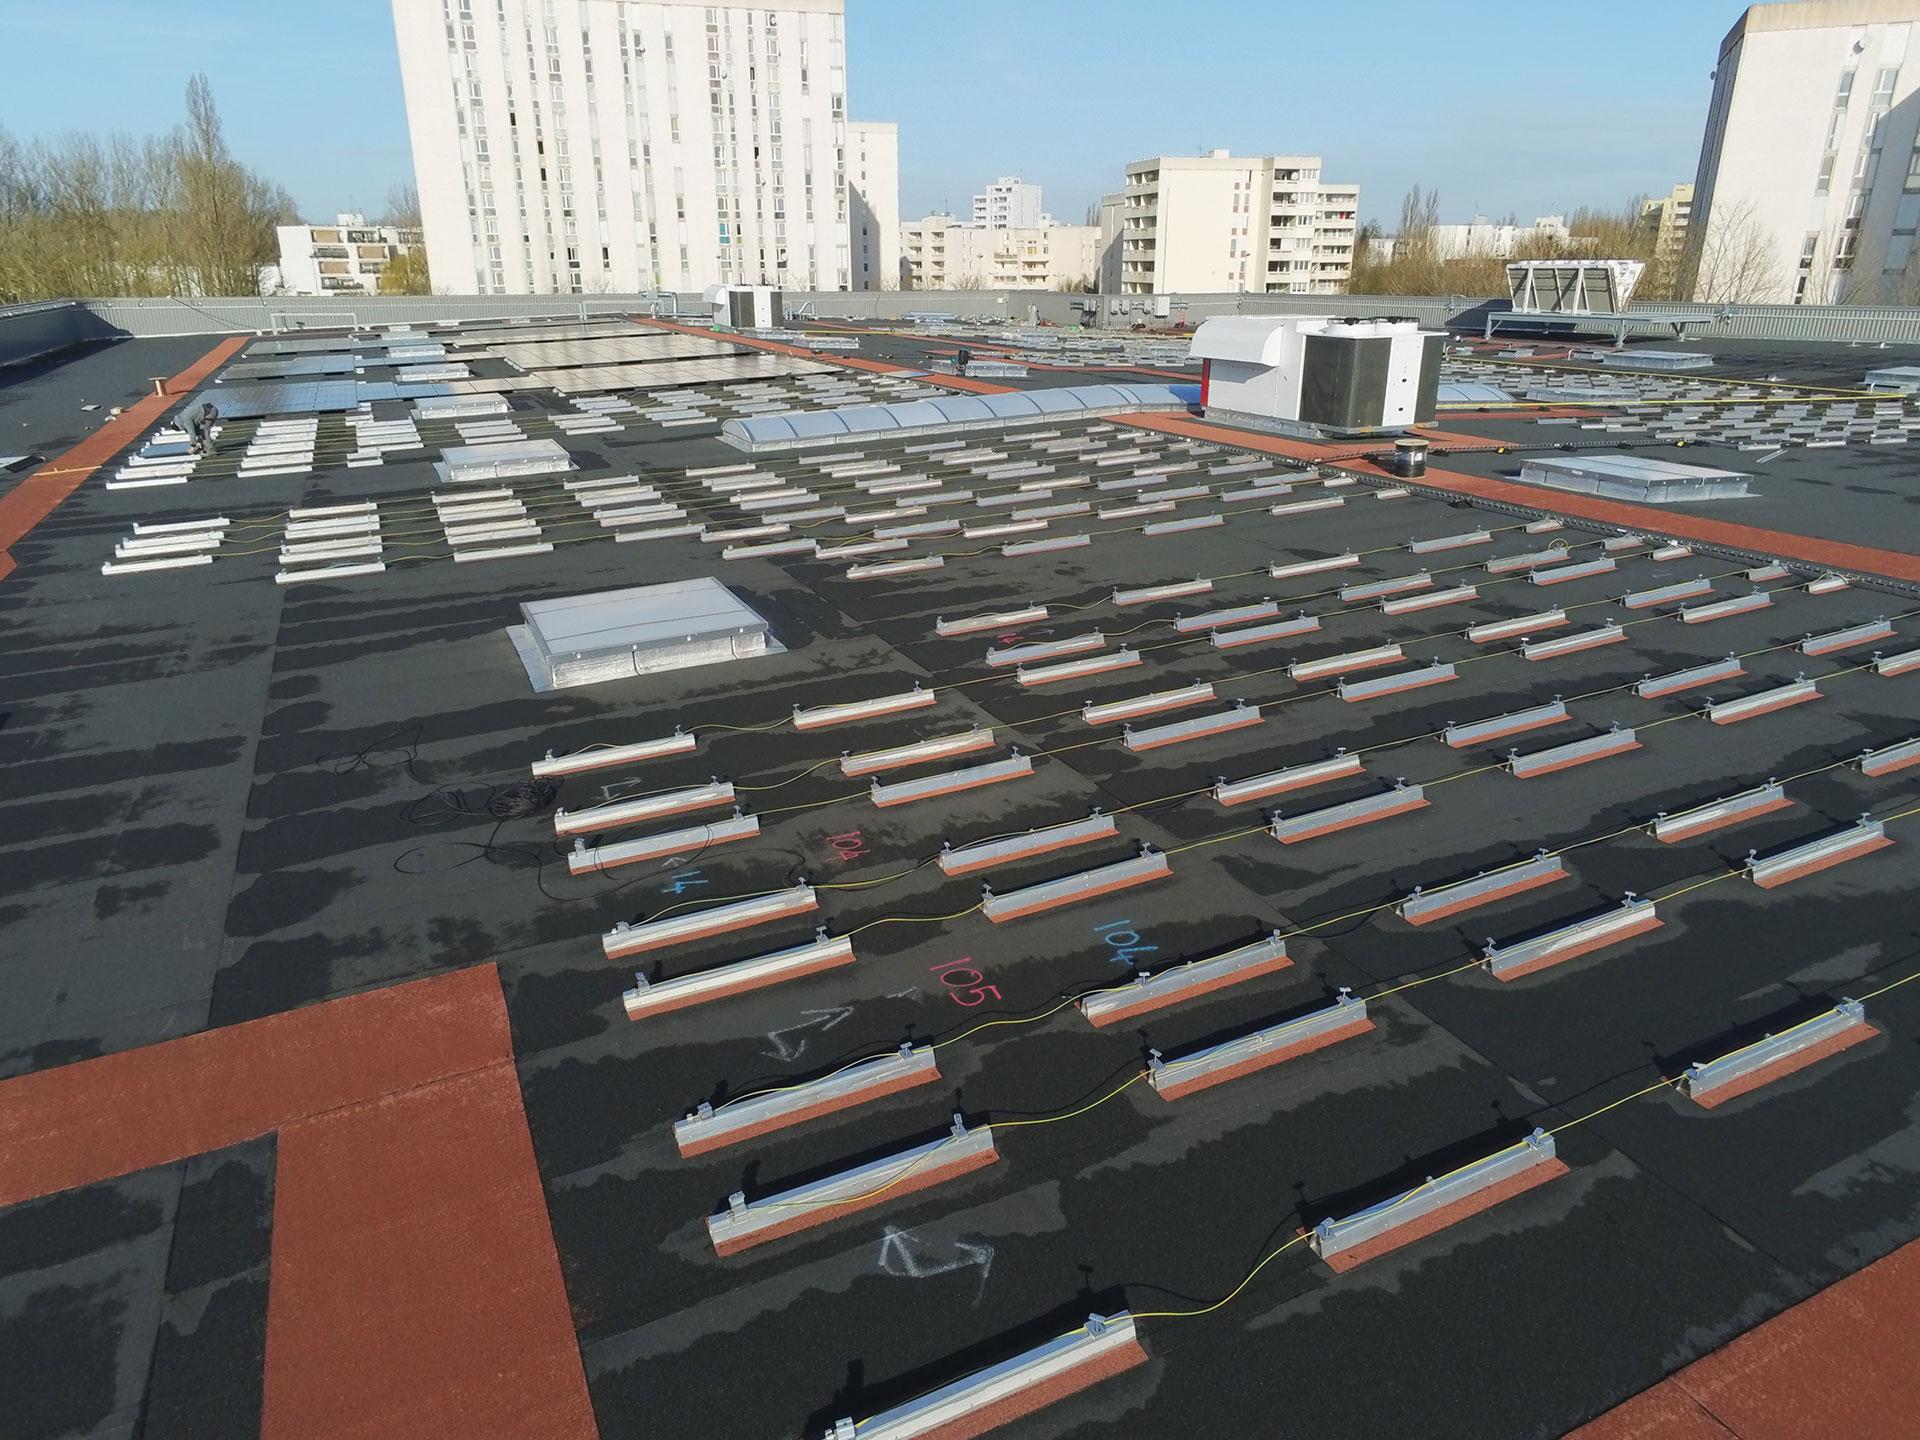 Installation-solar-panels-bitumen-flat-roof-supermarket